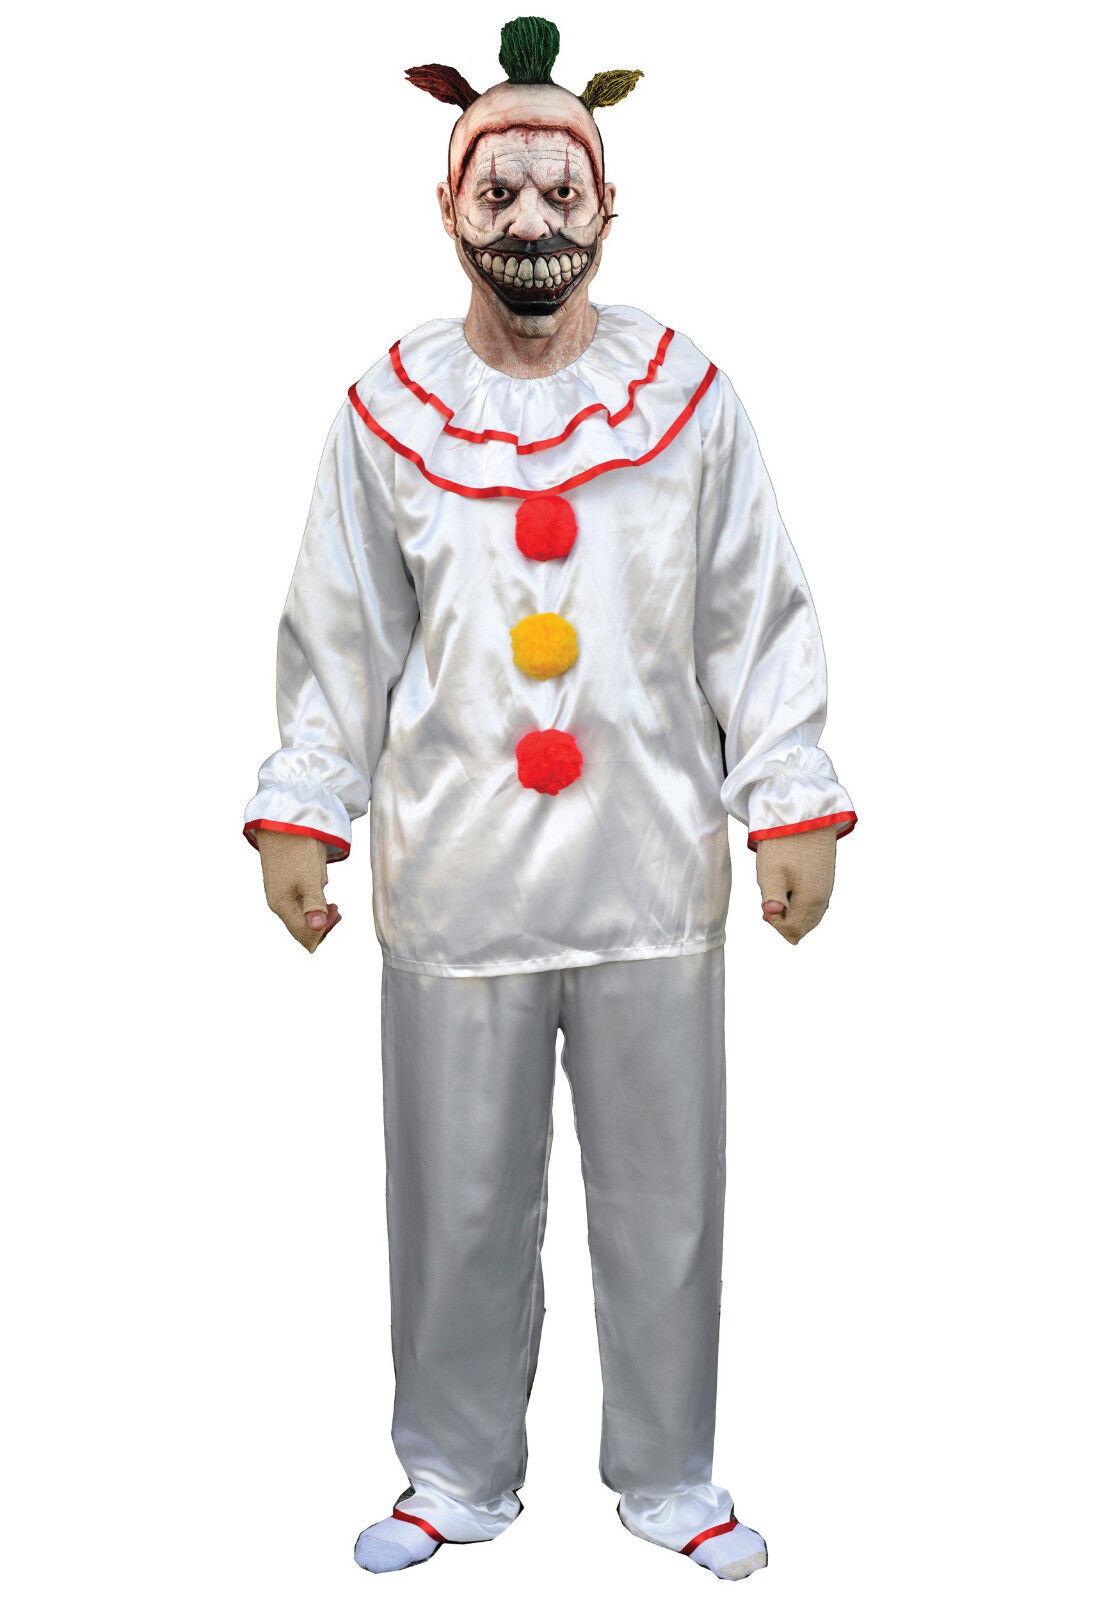 Twisty the Clown American Horror Story Freak Show Scary Halloween Adult Costume